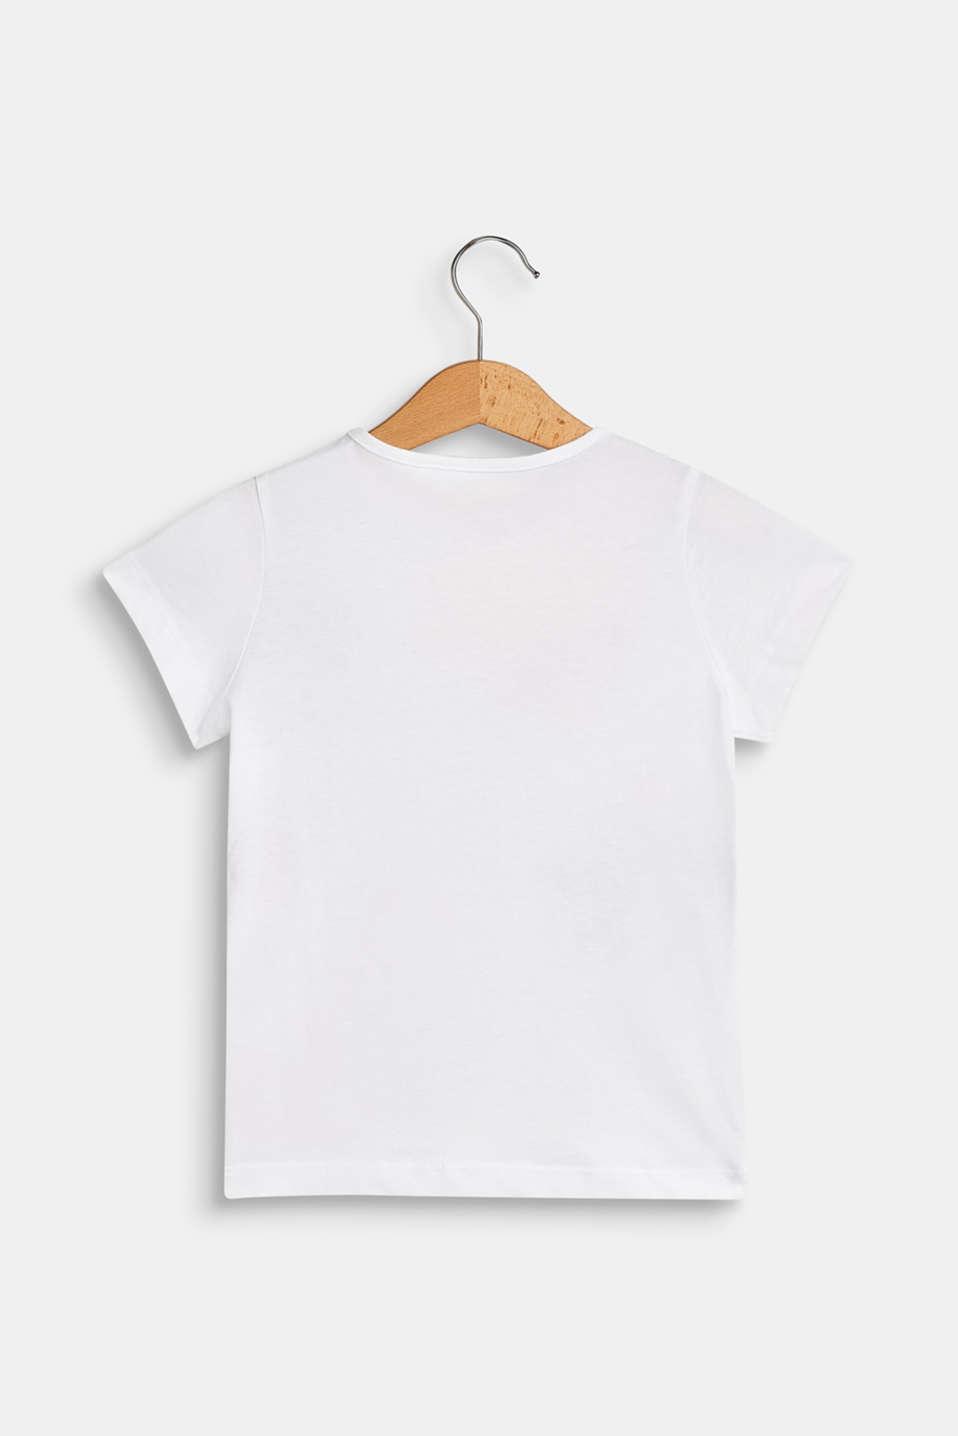 Flock print T-shirt, 100% cotton, WHITE, detail image number 1